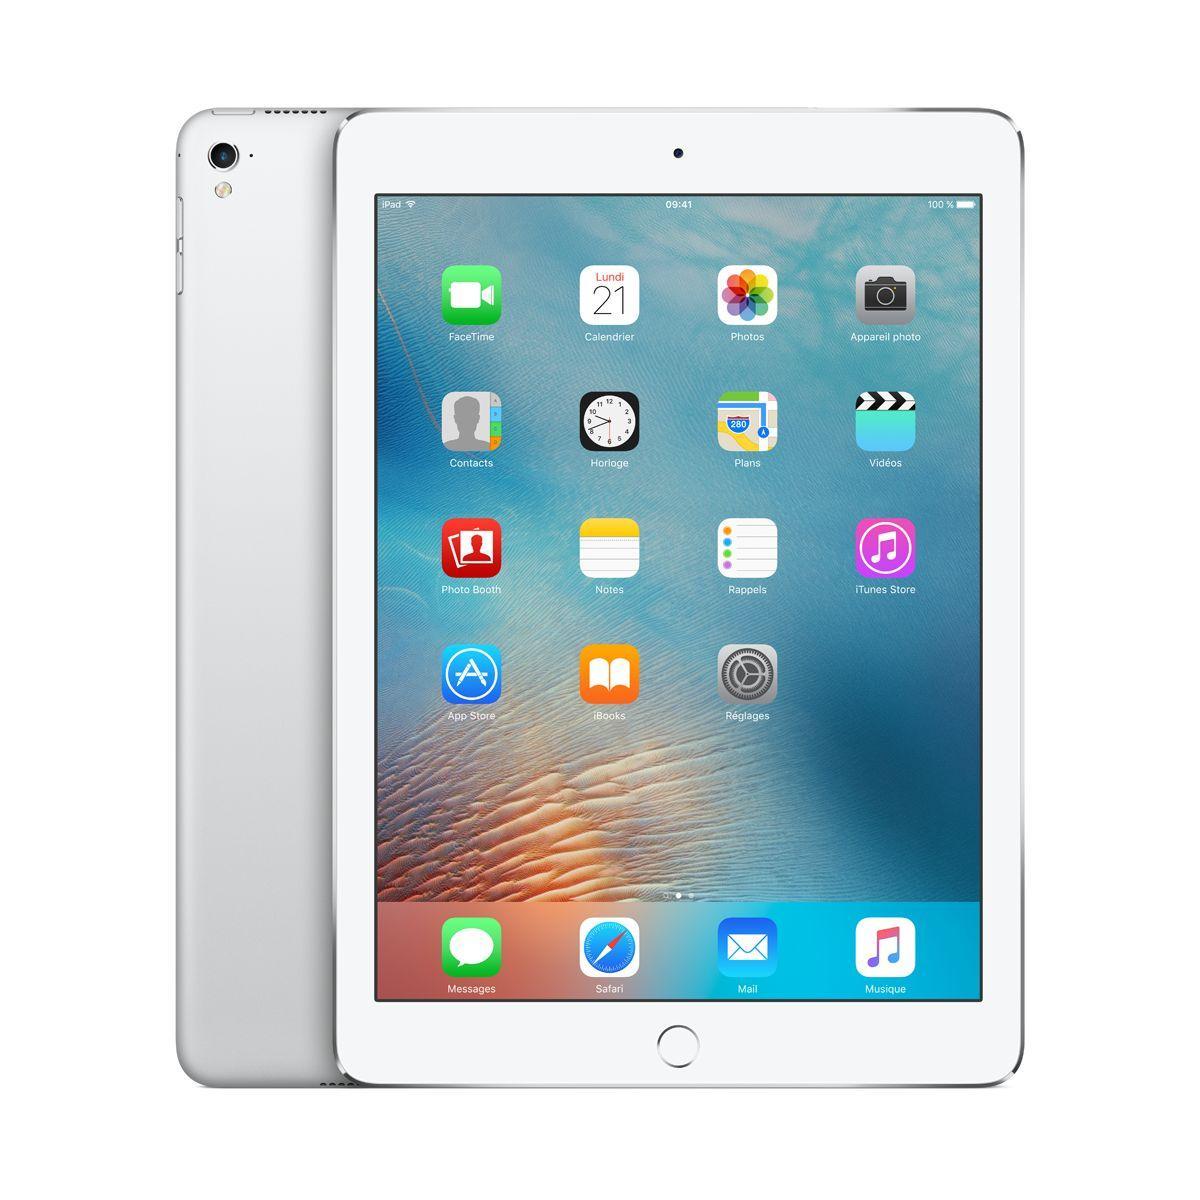 Apple ipad pro 9.7 32go argent (photo)